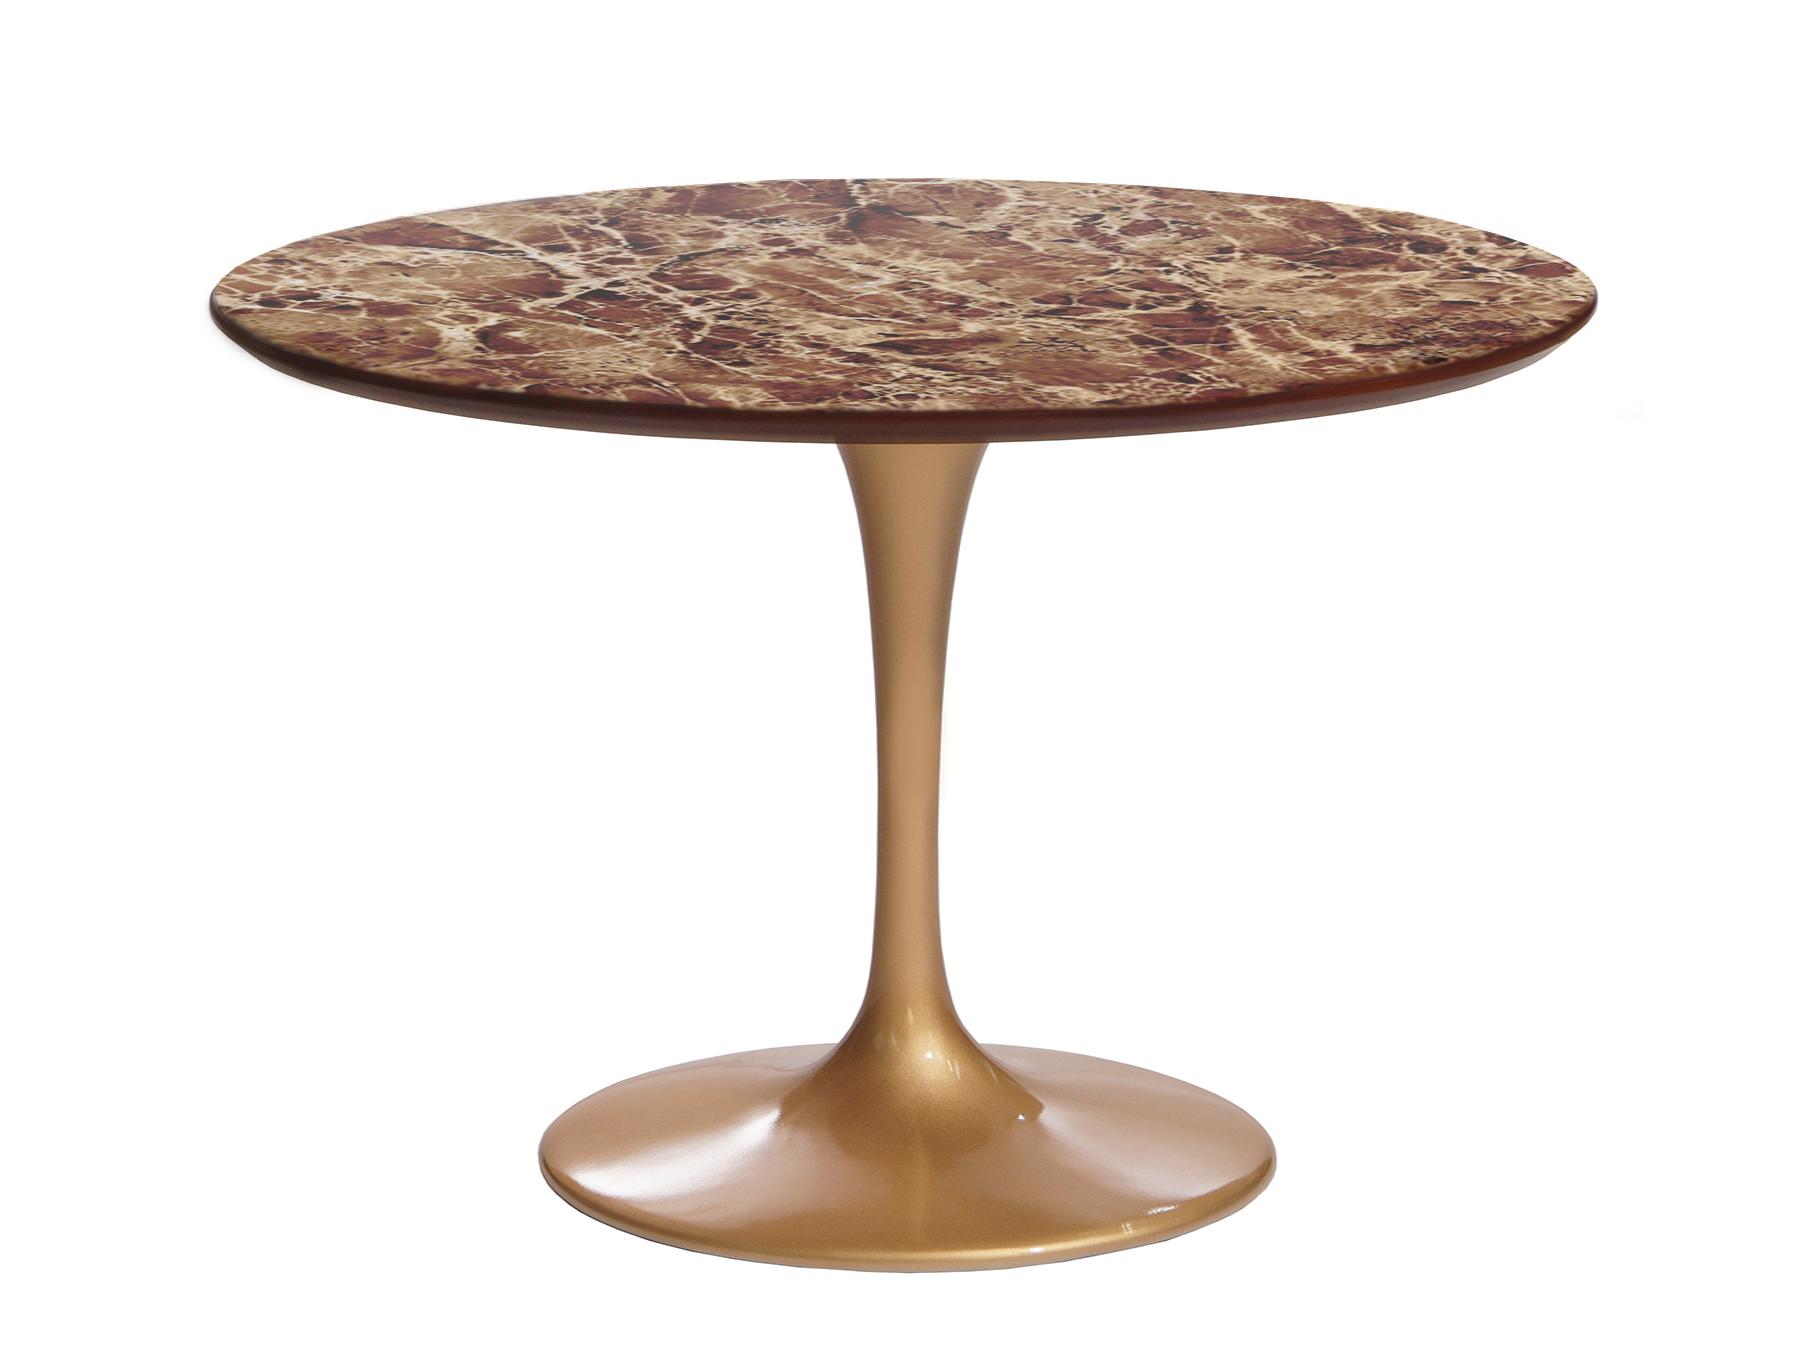 Кухонный стол ActualDesign 9981441 от thefurnish